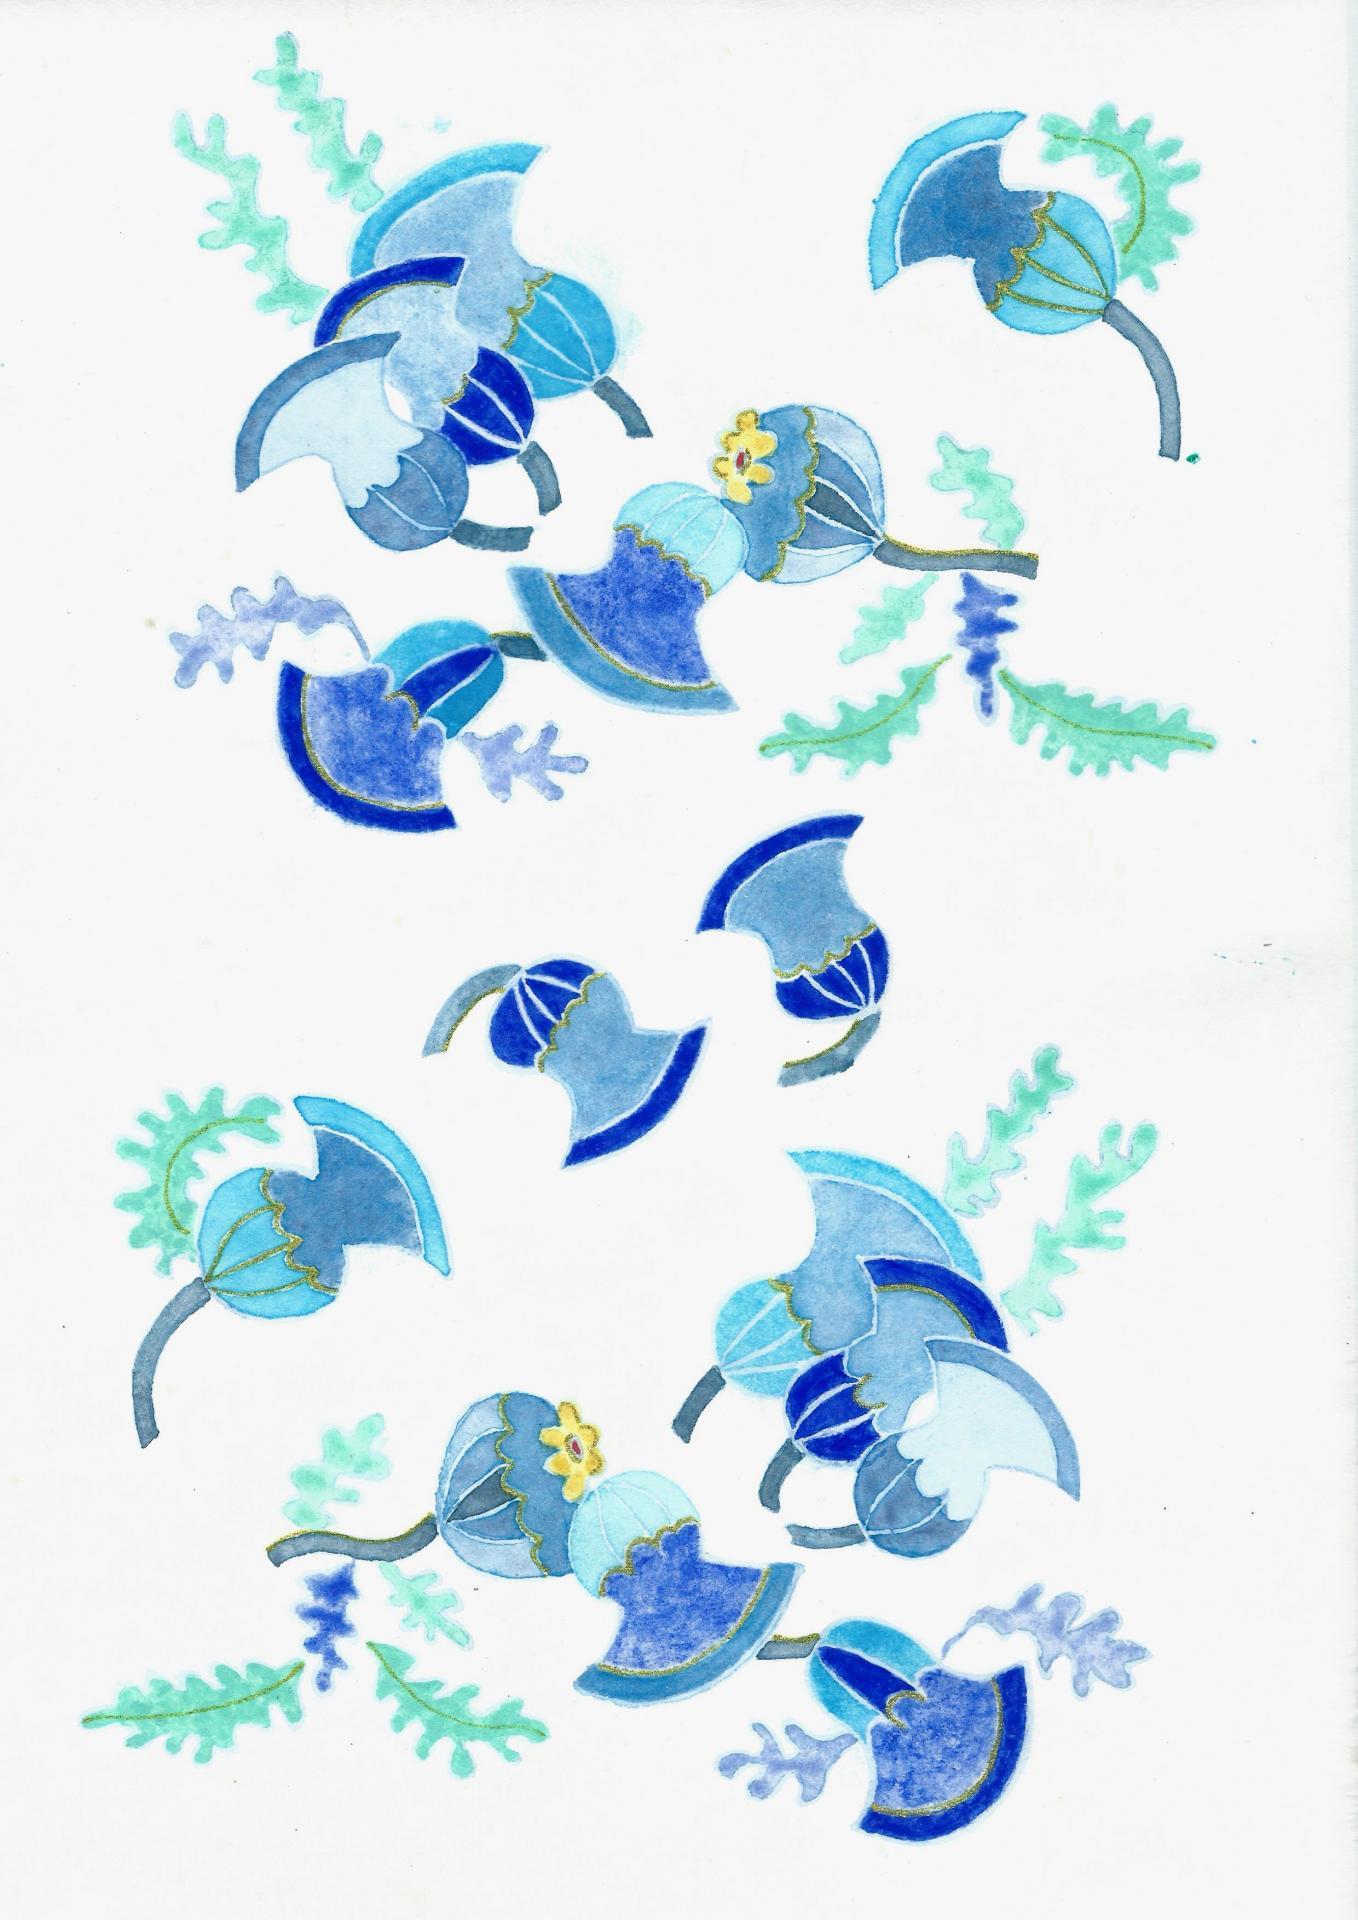 Algues et anemones de mer style retro envoi 2017